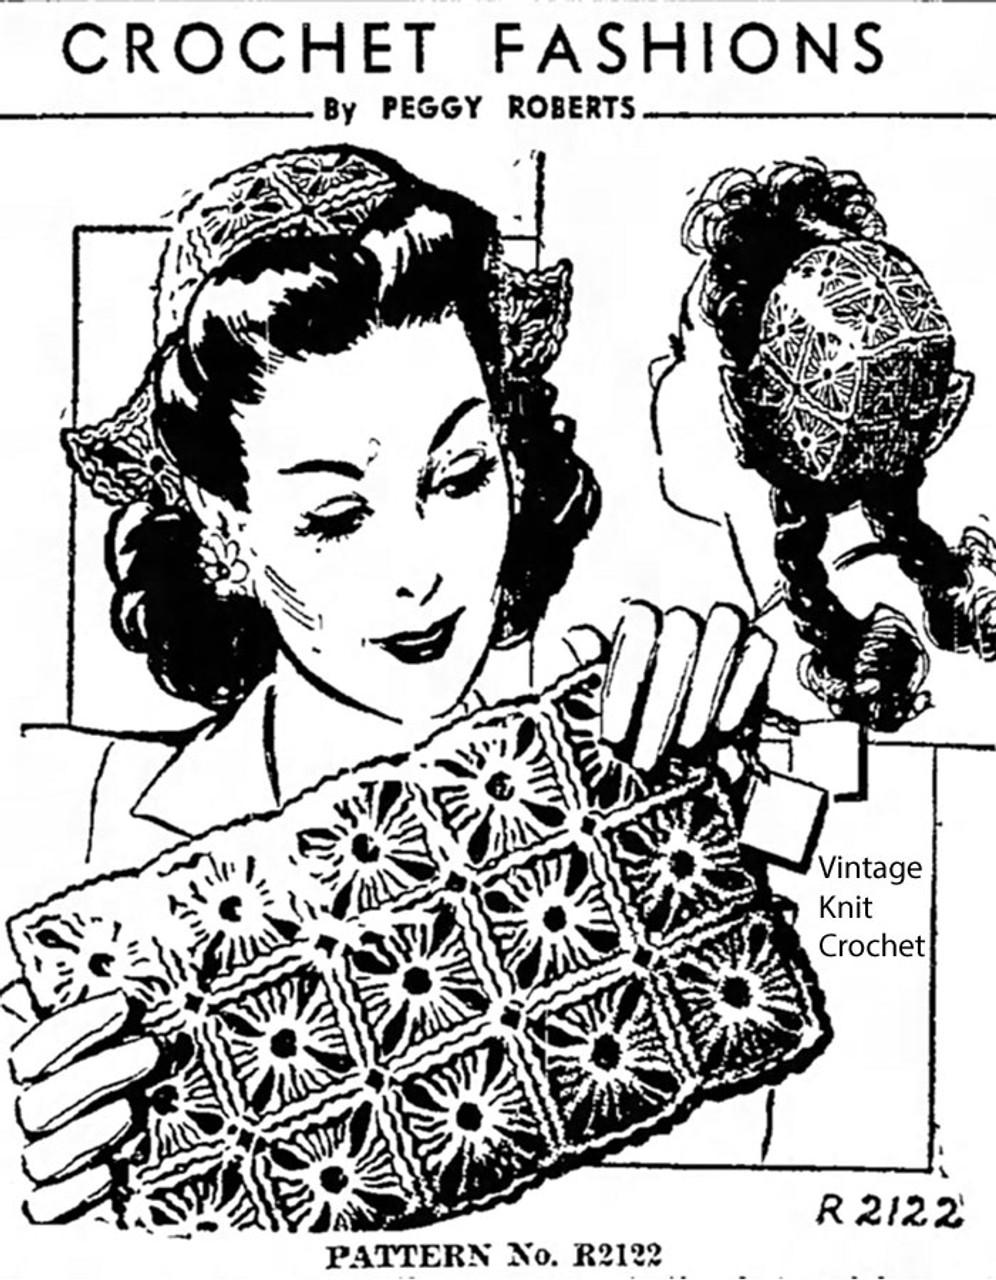 Crochet Dutch Cap Pattern, Peggy Roberts 2122